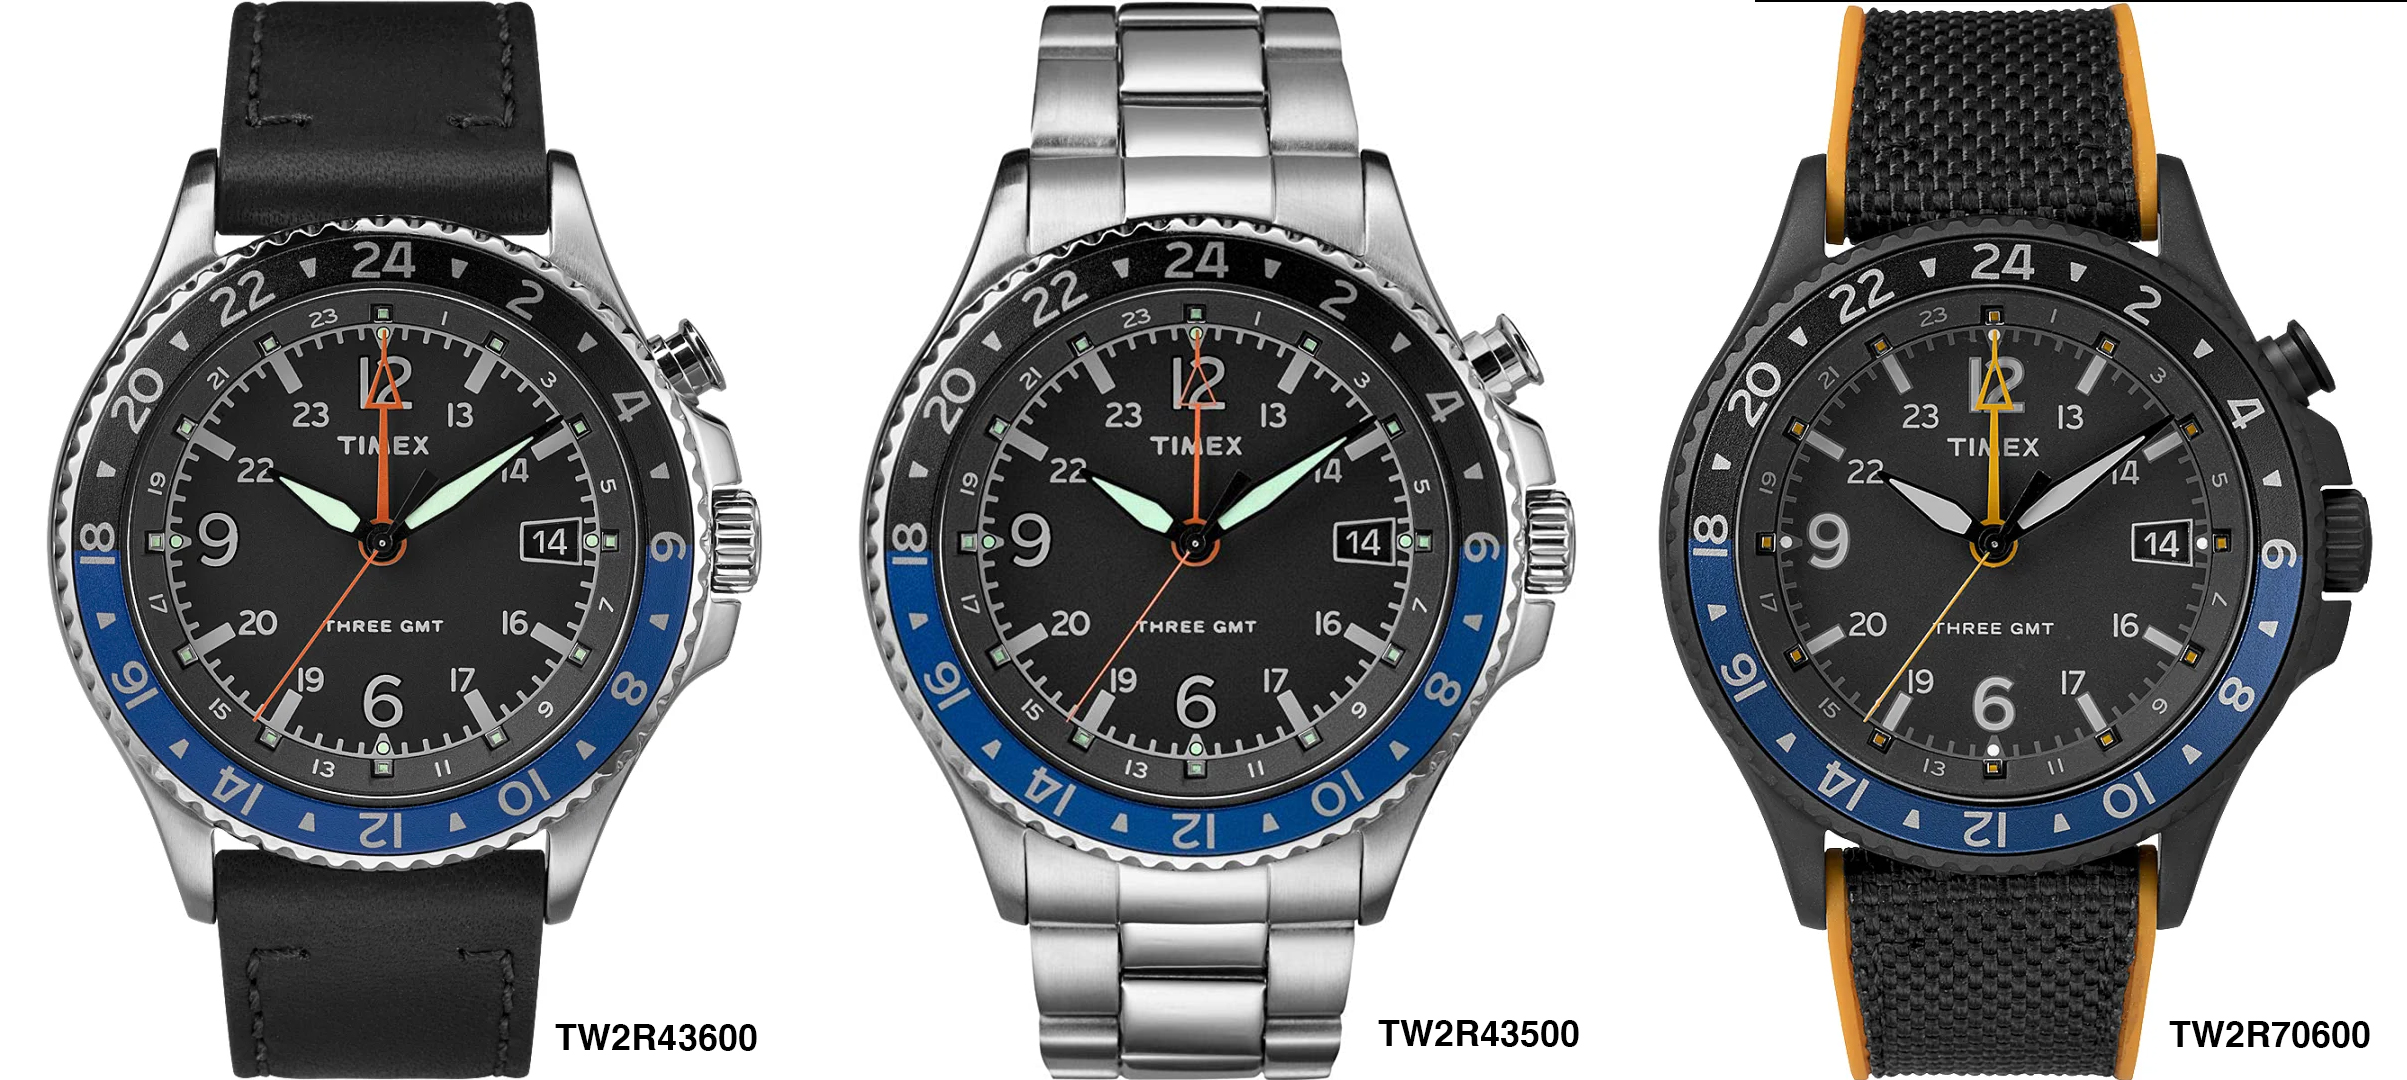 timex-allied-three-models.jpg